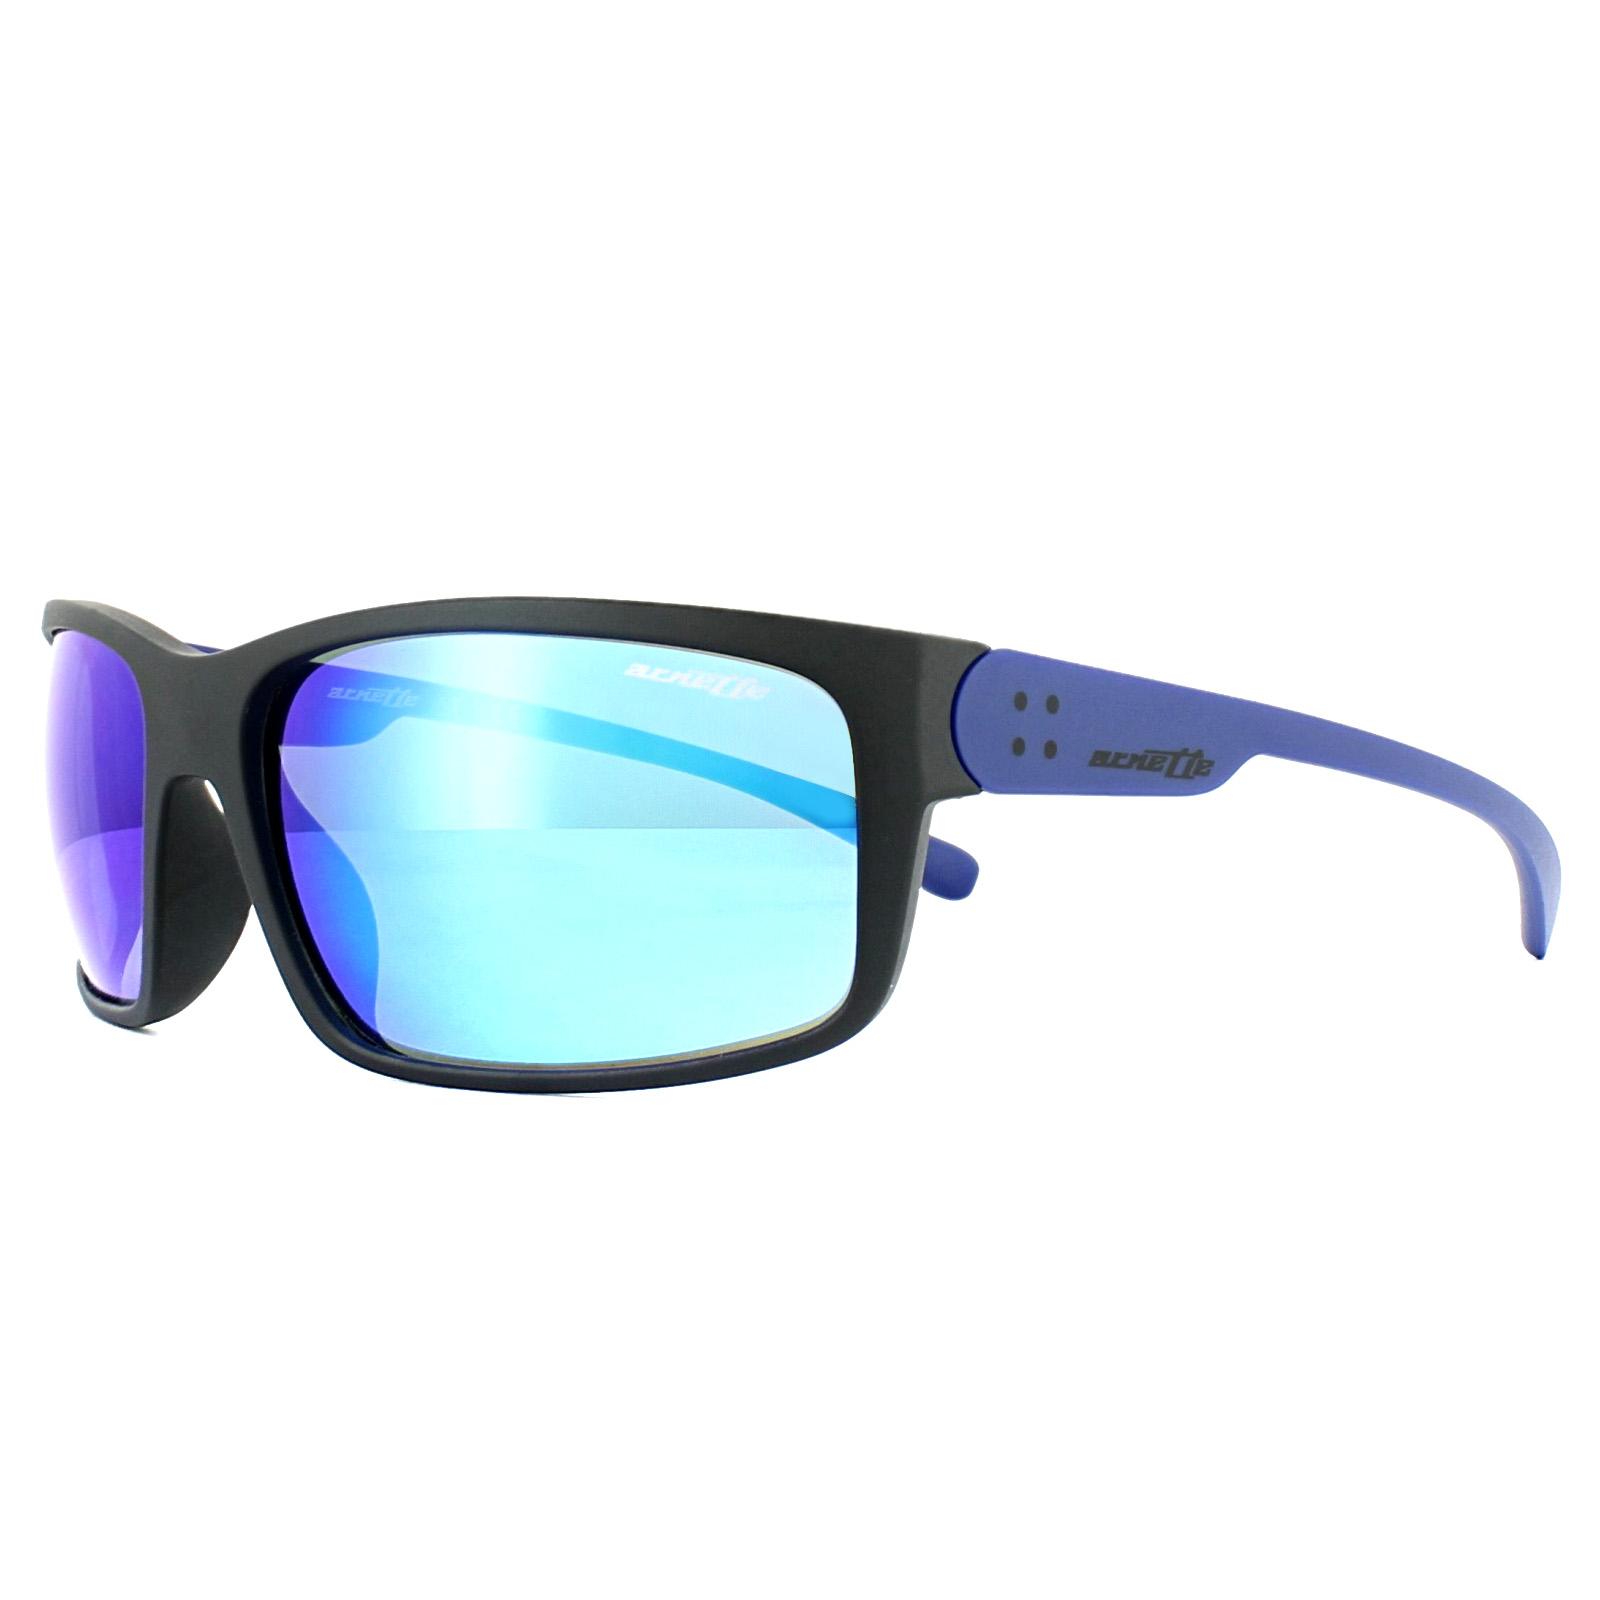 51cfd479ac3 Sentinel Arnette Sunglasses Fastball 2.0 4242 251125 Matt Black Blue  Mirror. Sentinel Thumbnail 2